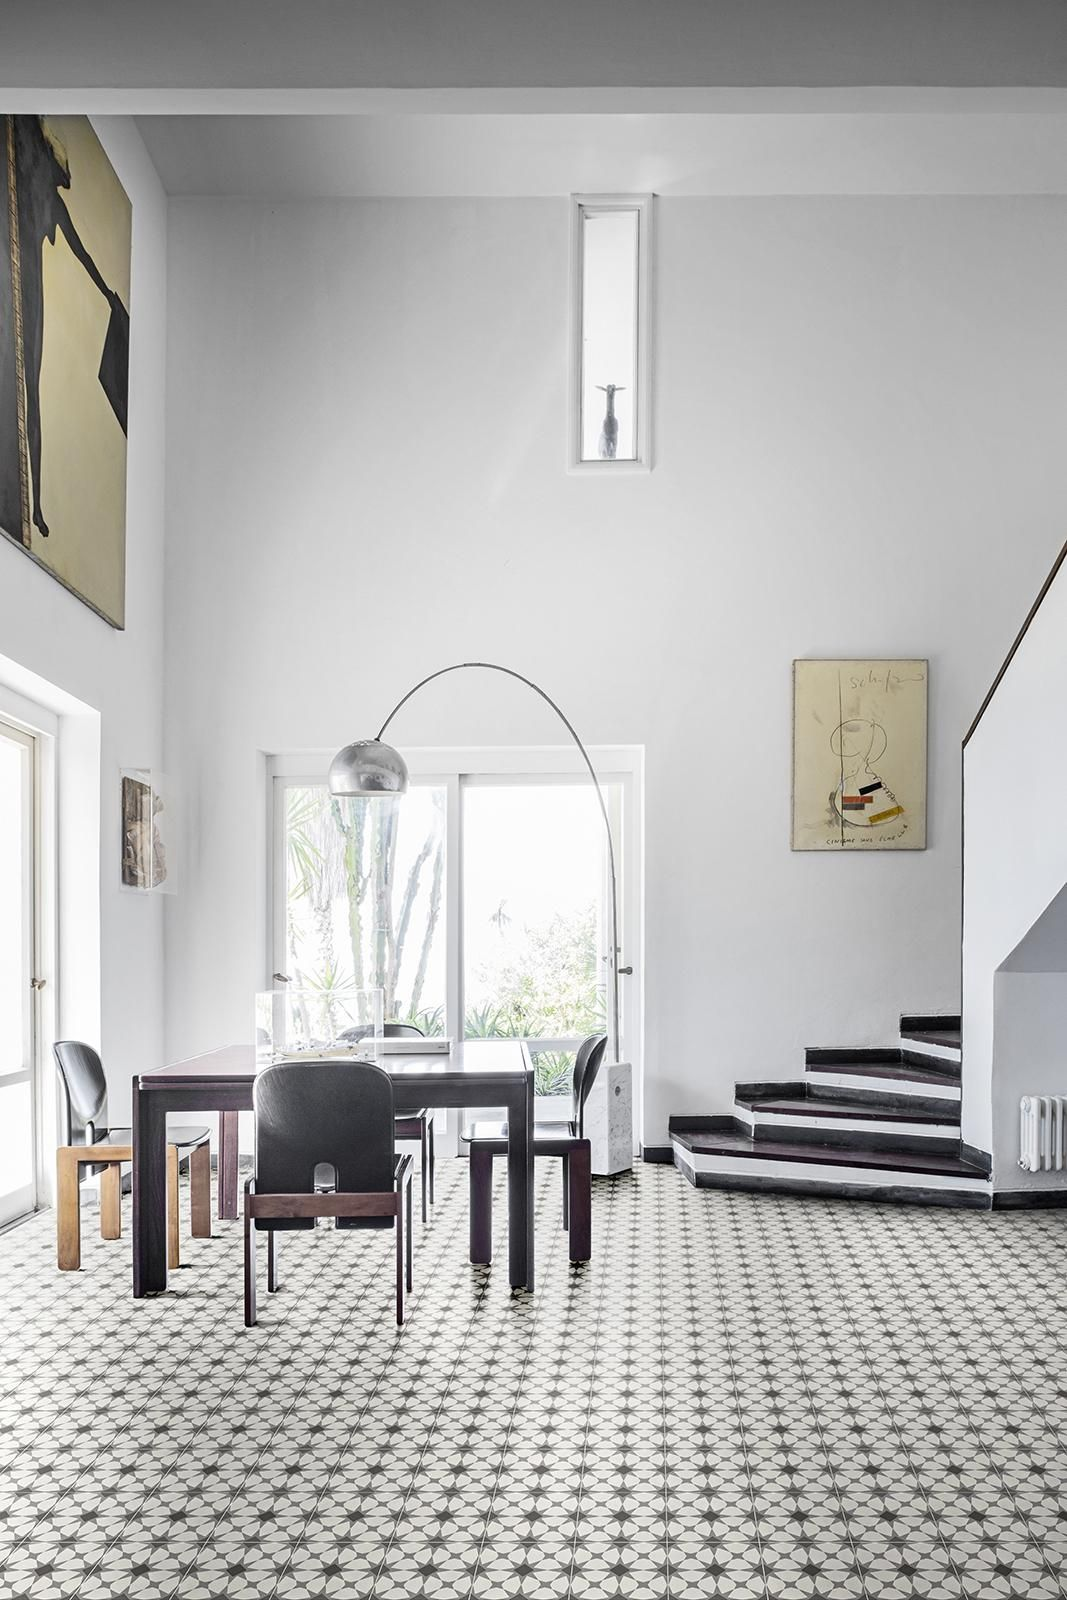 bold patterns for beautiful homes patterned tiles tiles kitchen rh pinterest com